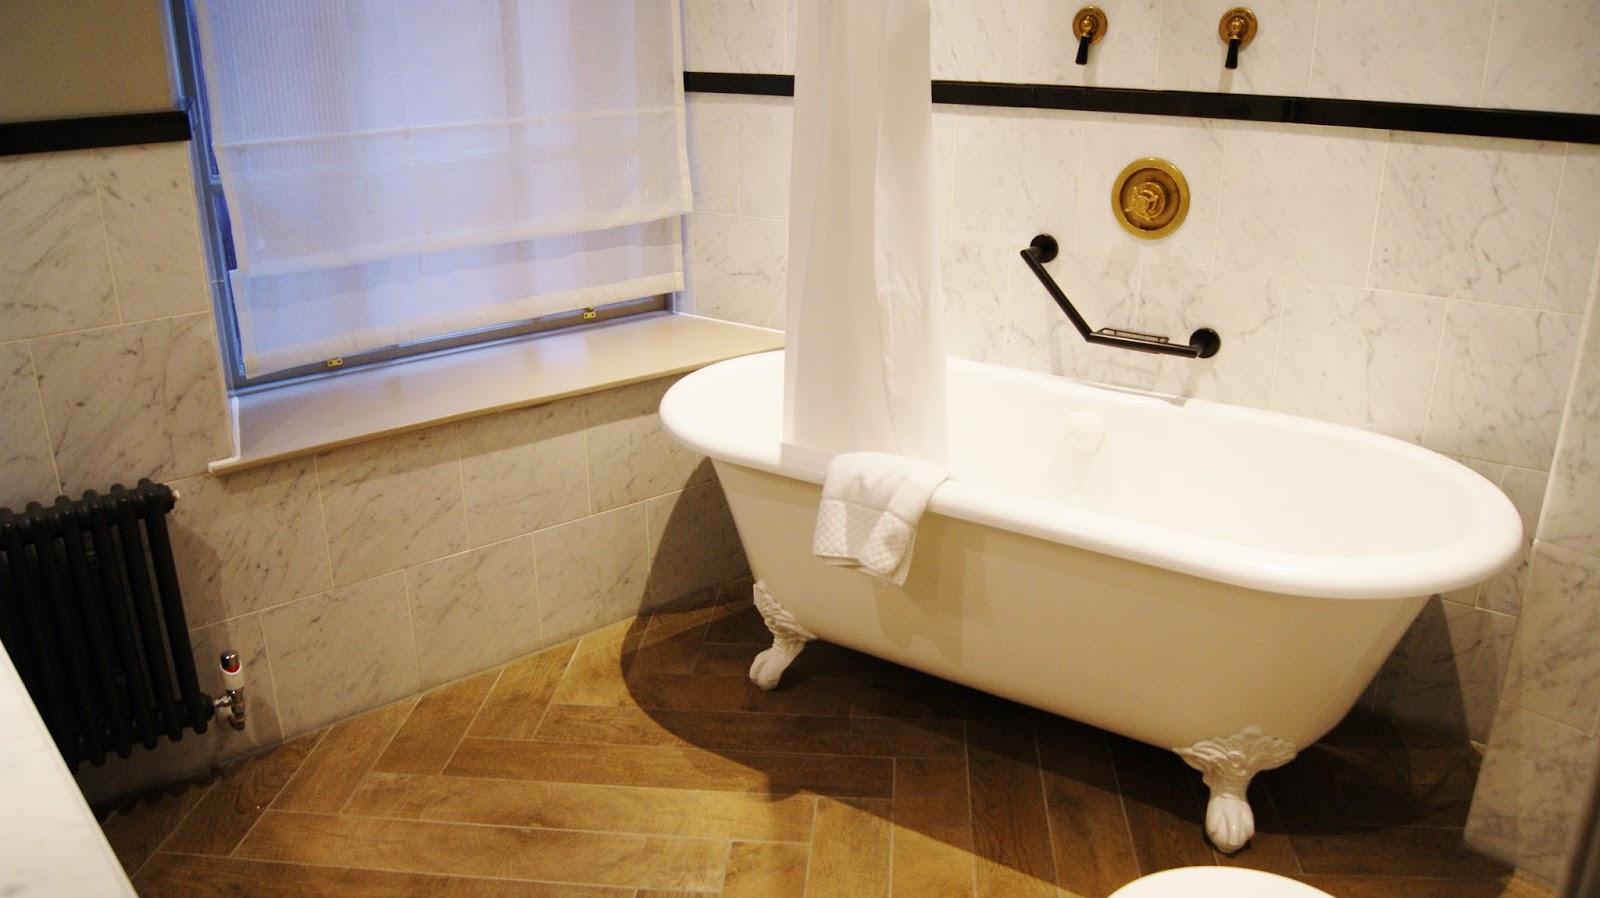 Bathroom suites glasgow - Grand Central Hotel Glasgow Junior Suite Bathroom